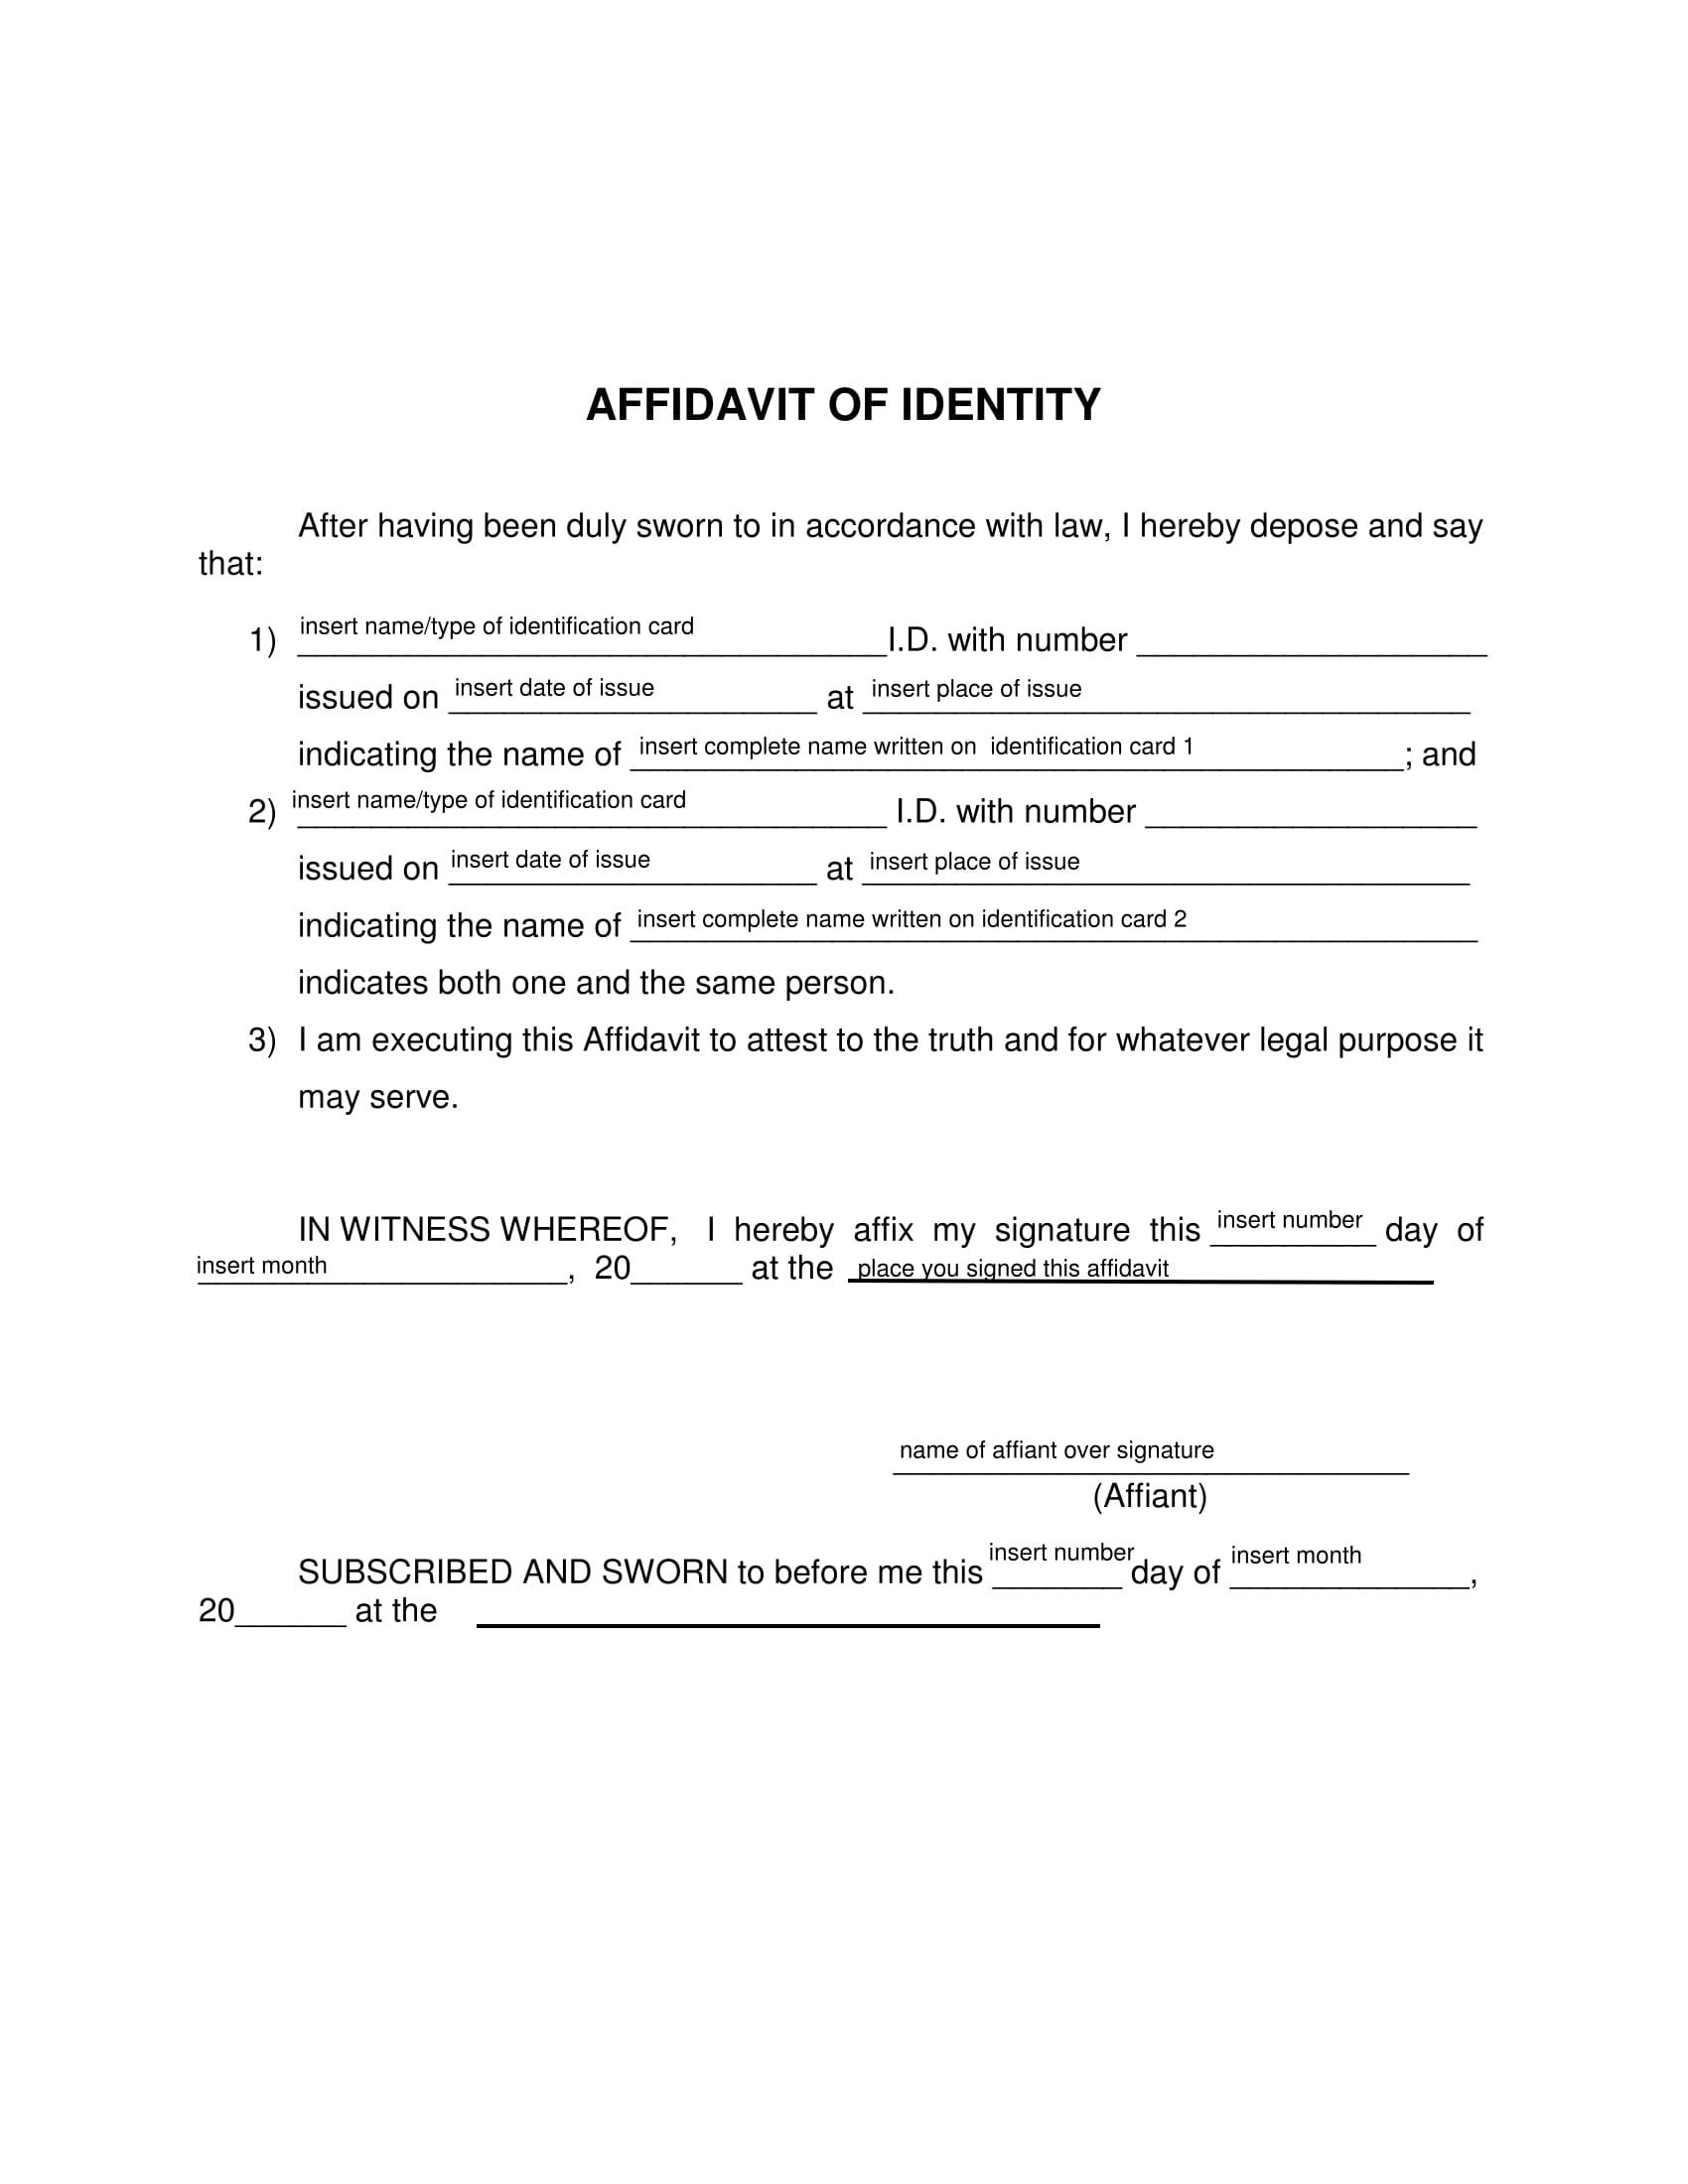 id card affidavit of identity 1